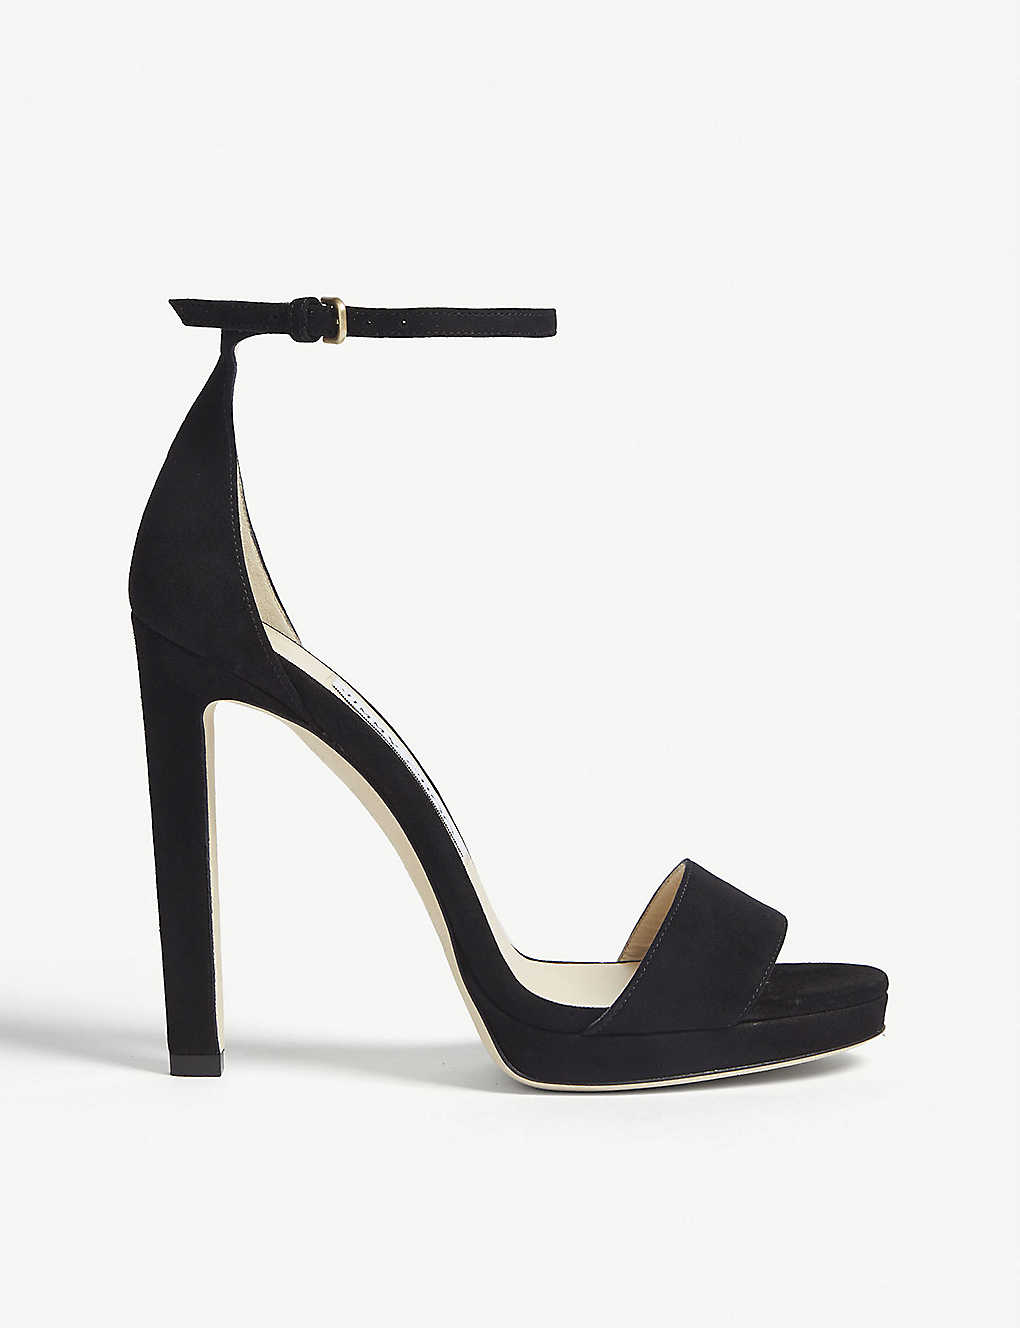 b1790a033fe JIMMY CHOO - Misty 120 suede heeled sandals